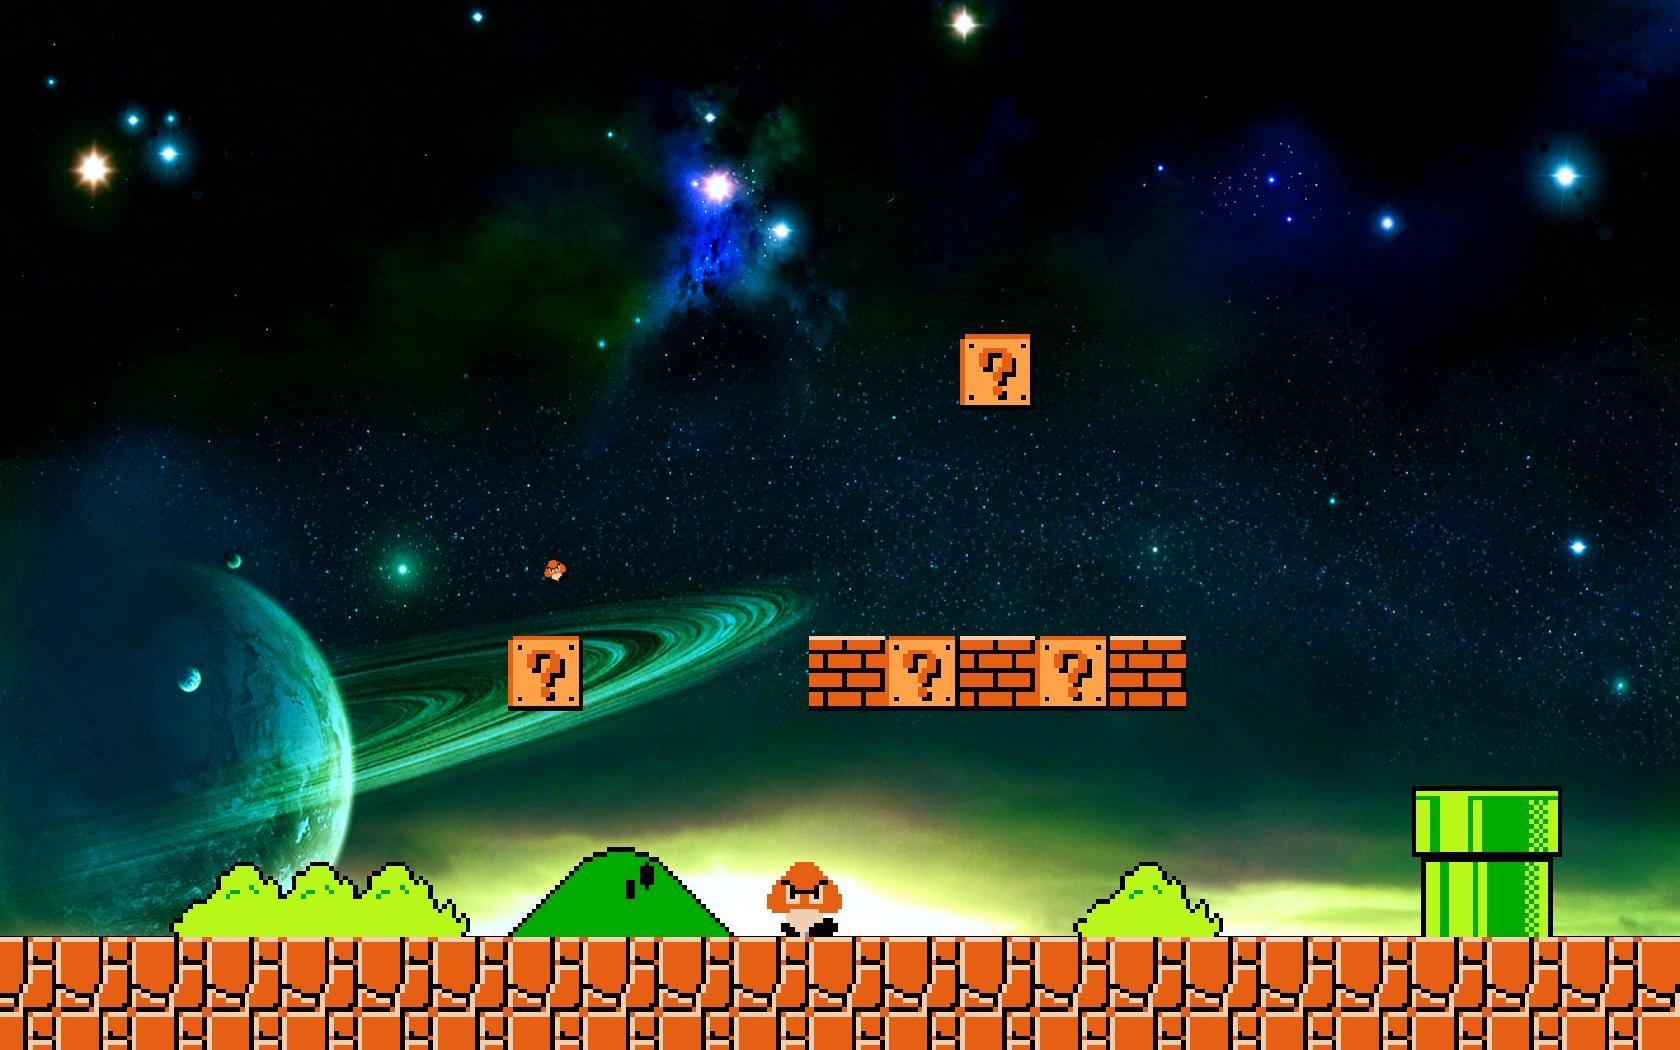 Hintergrundbilder : Platz, Universum, Super Mario Bros ...